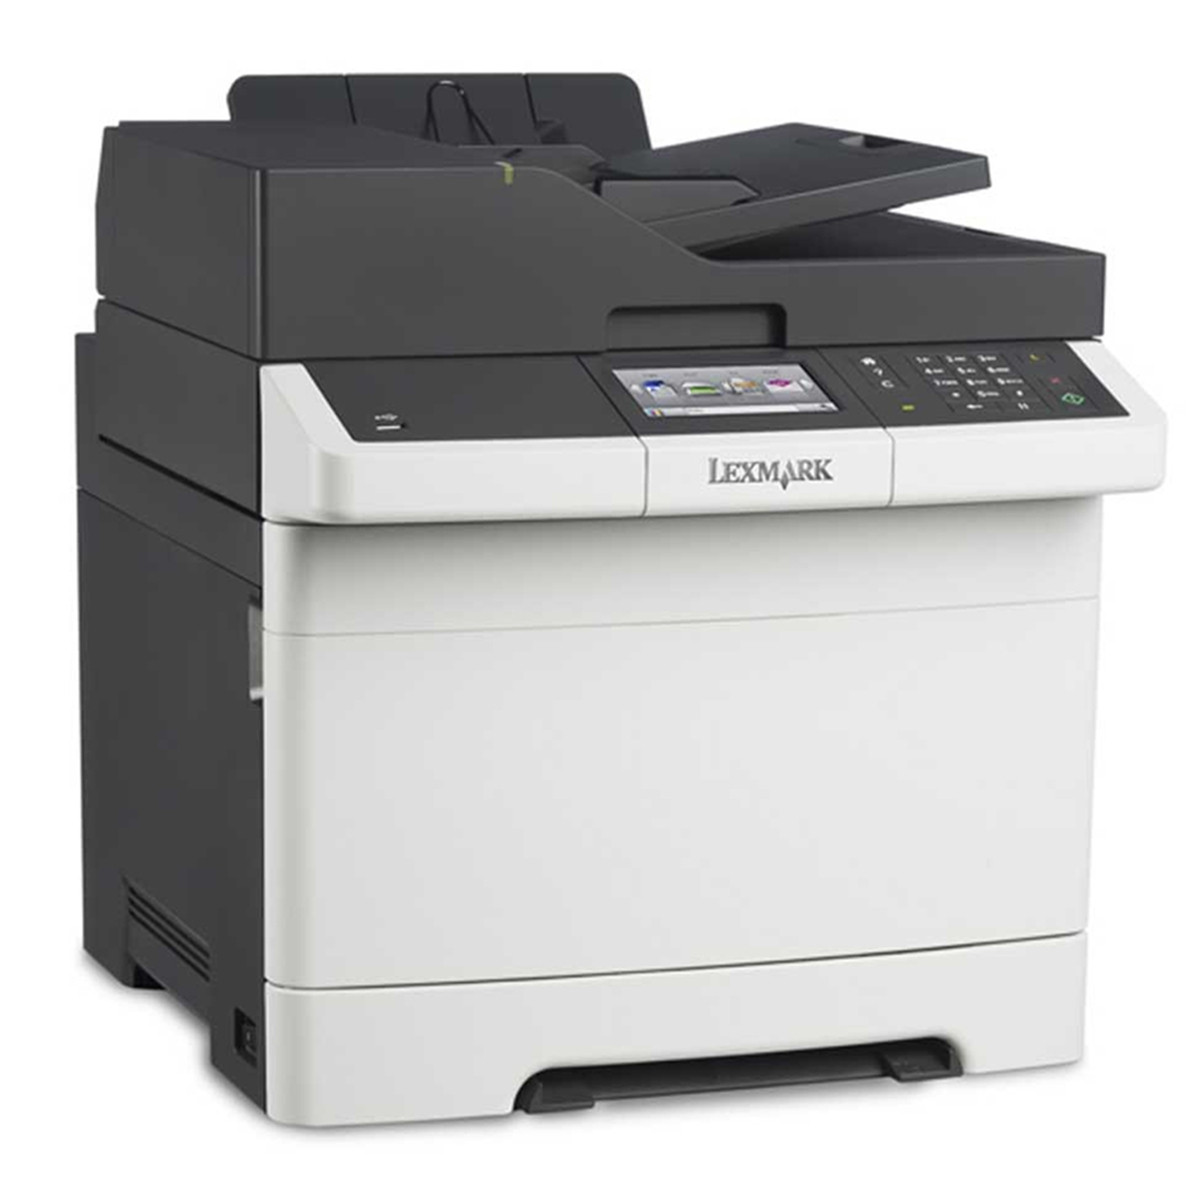 Impressora Lexmark CX417DE CX417   Multifuncional Laser Colorida com Duplex e Rede